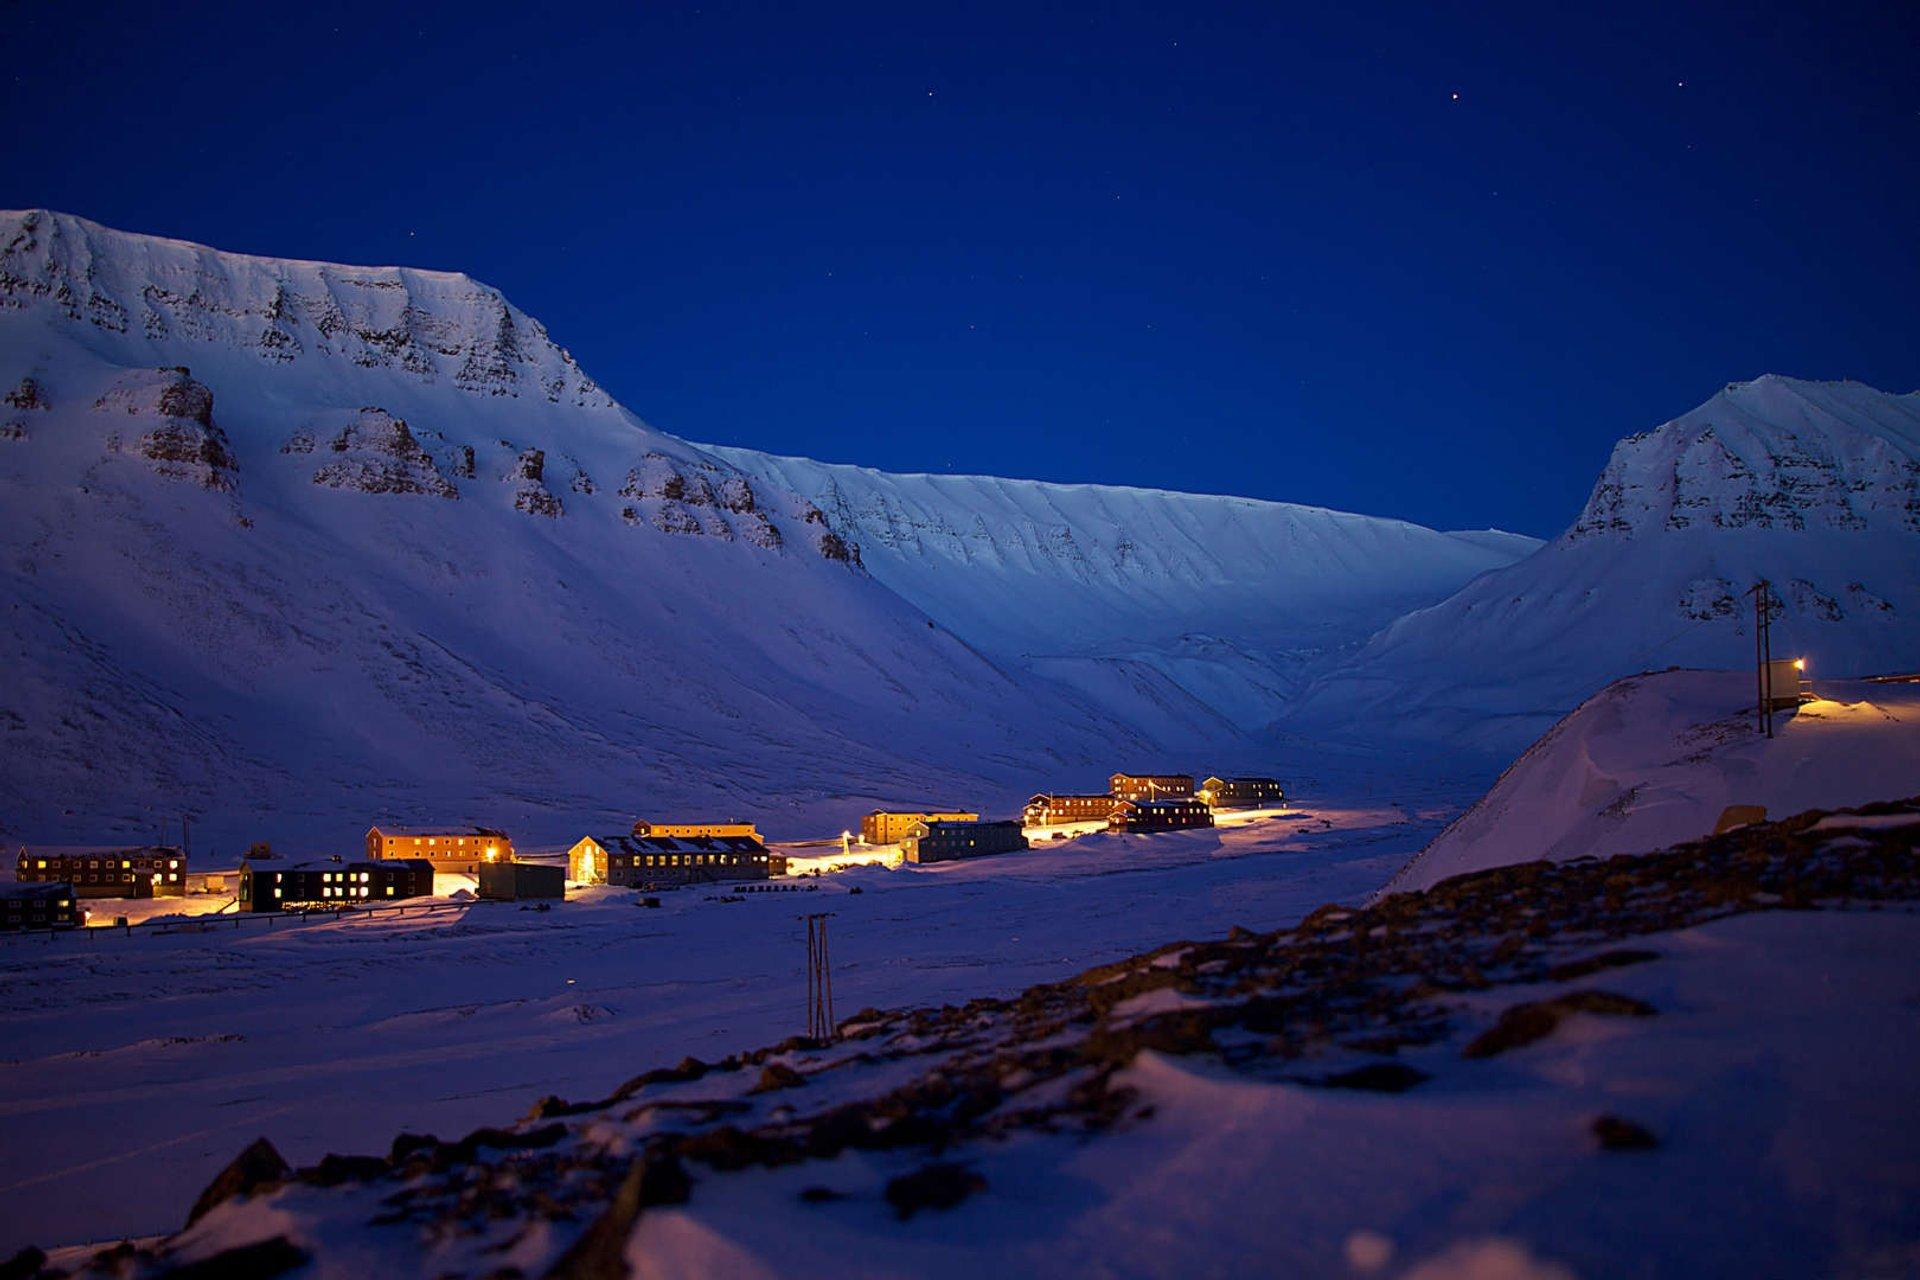 Polar Night in Svalbard 2019 - Best Time